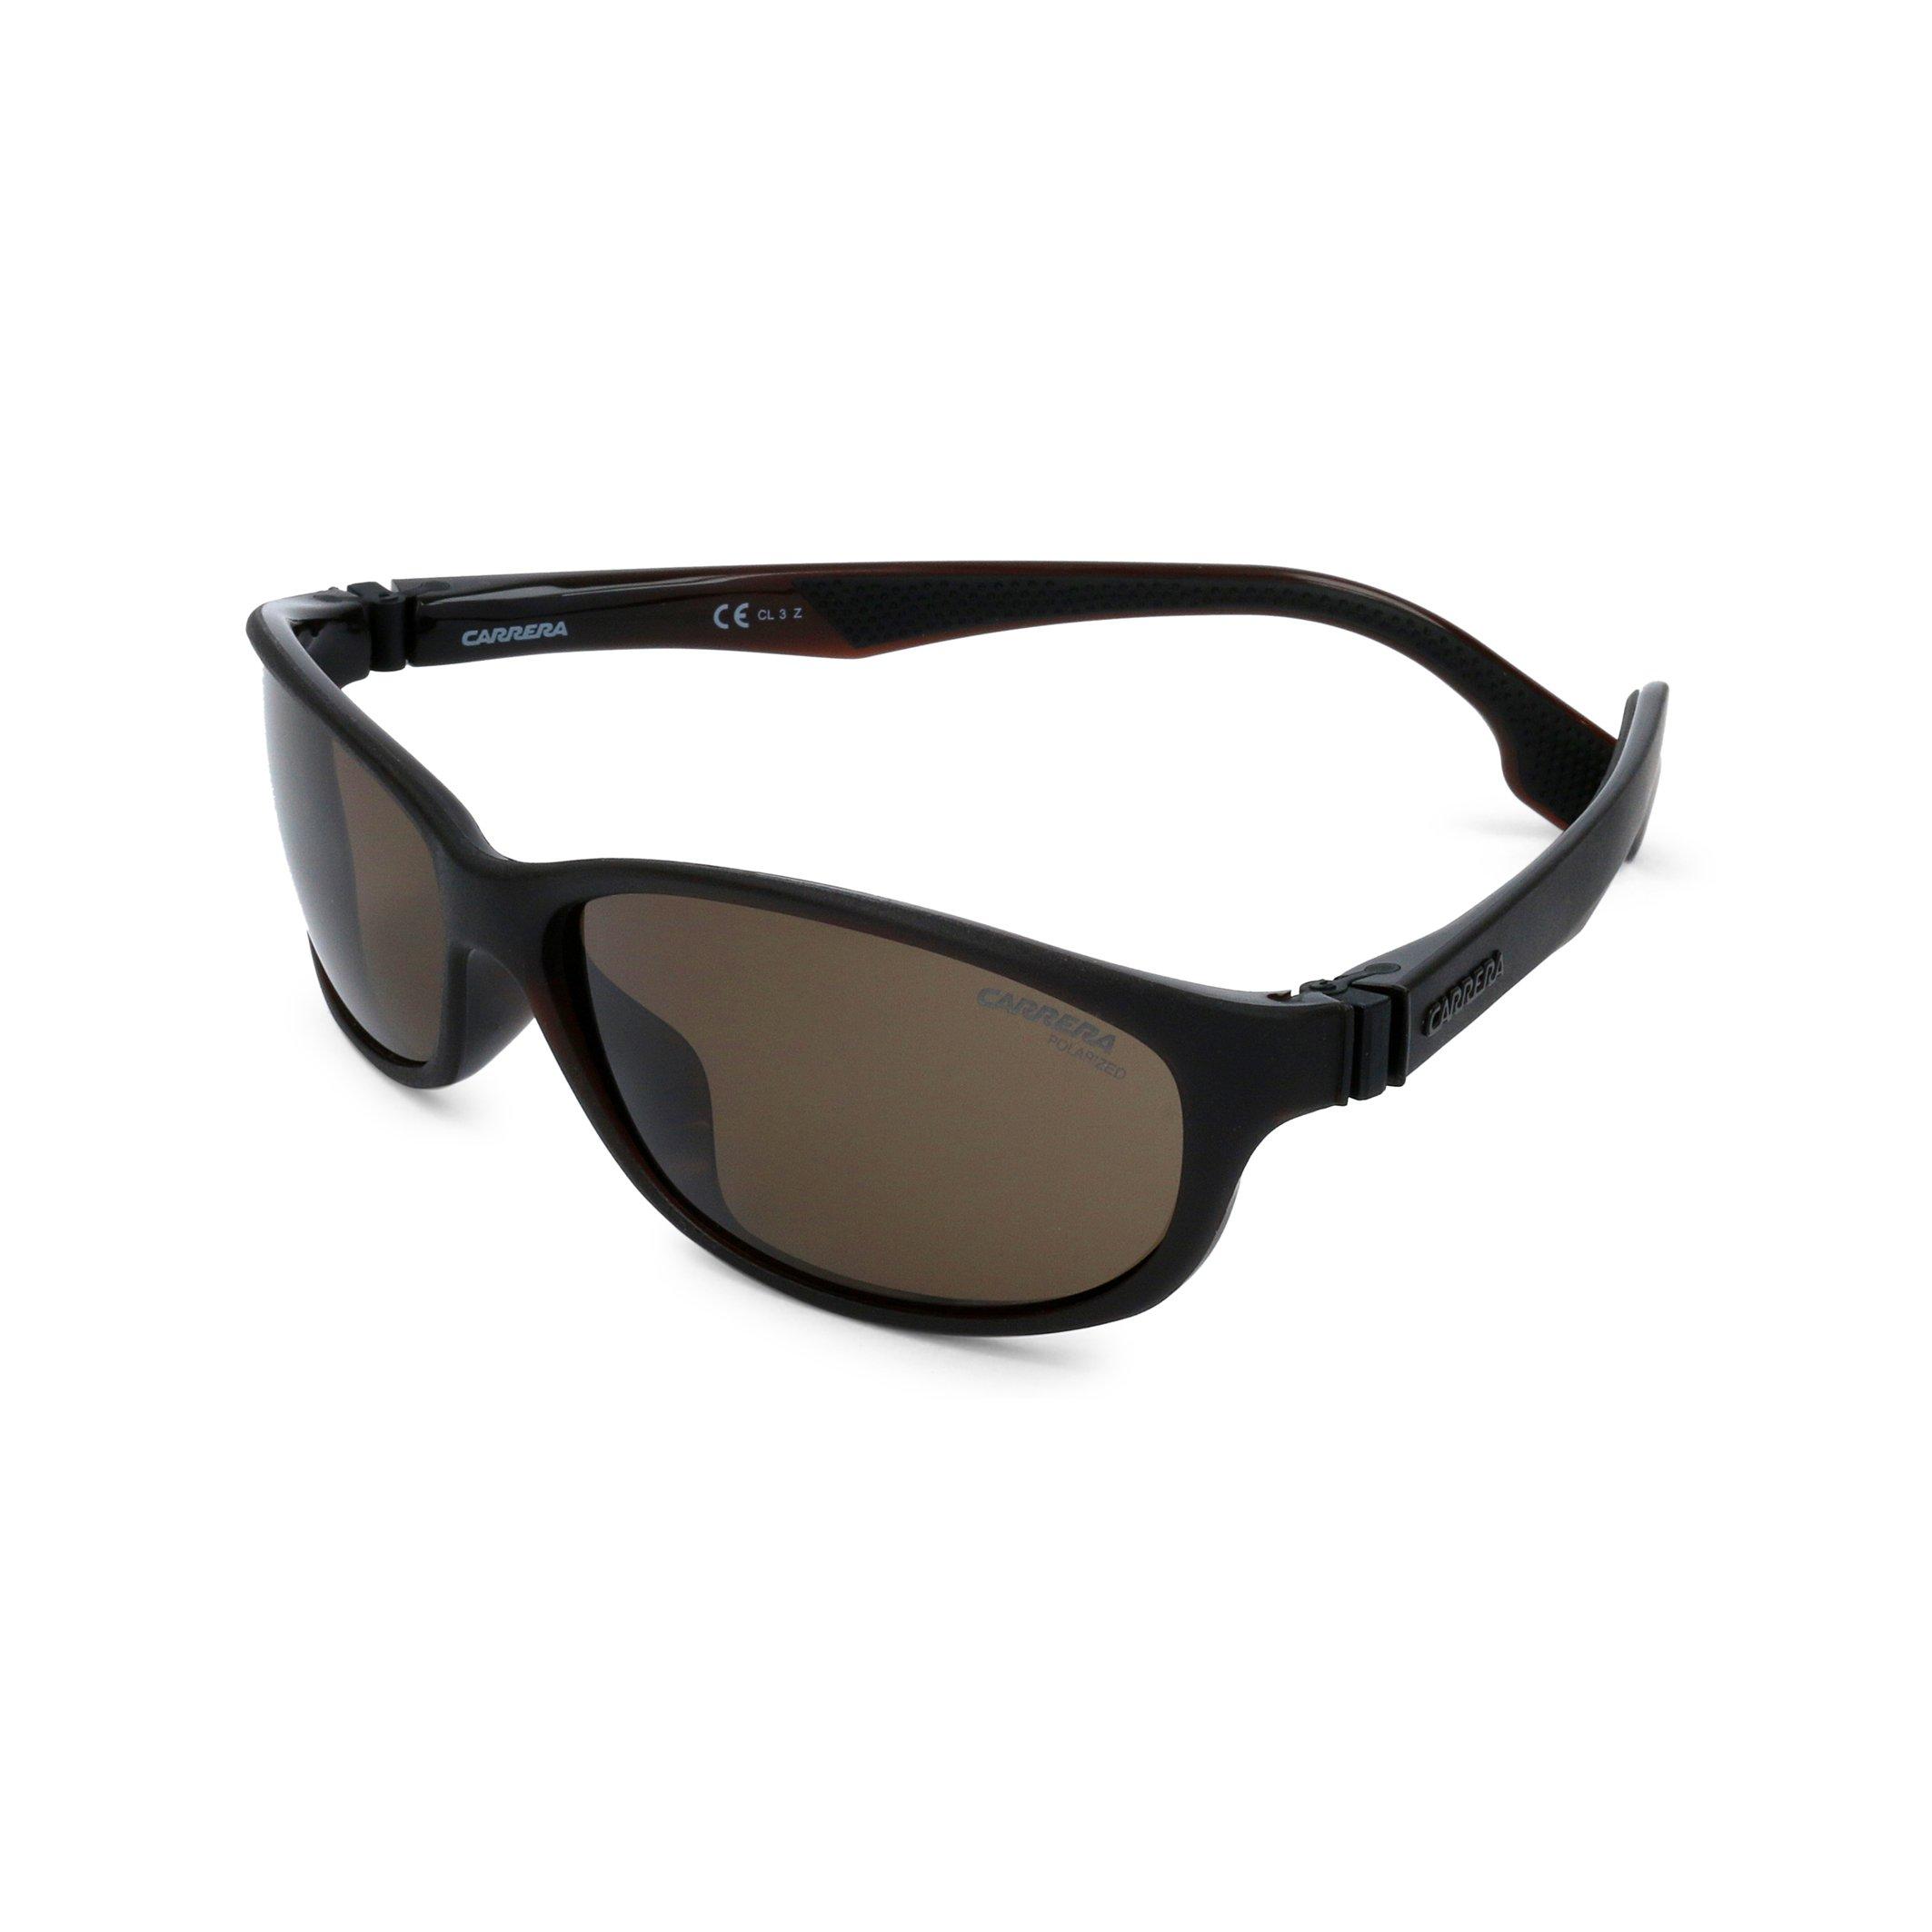 Carrera Men's Sunglasses Various Colours CARRERA5052S - brown NOSIZE